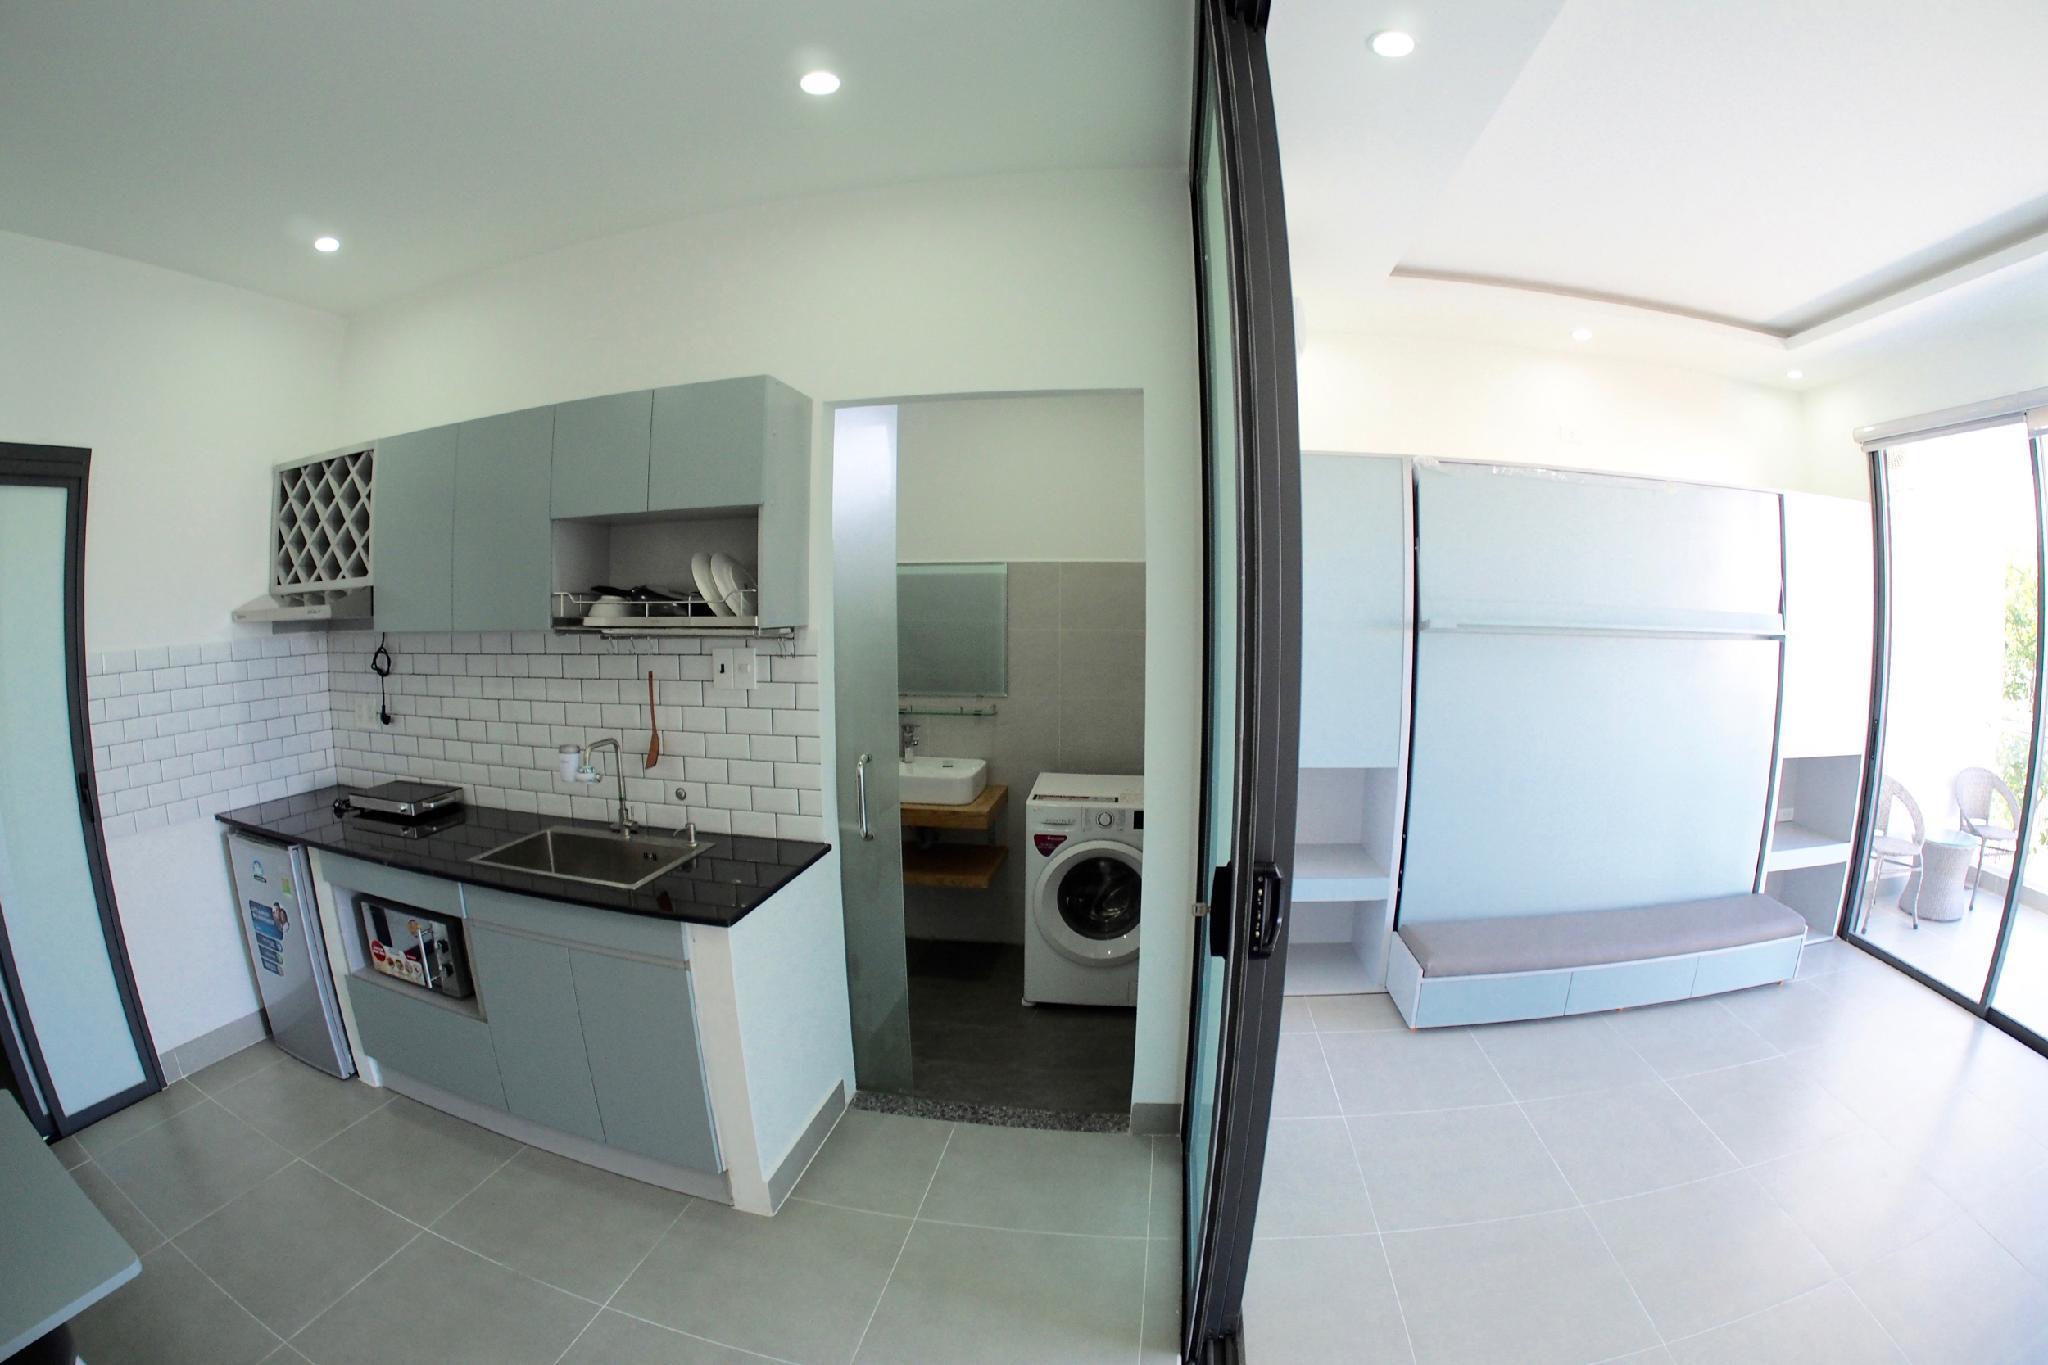 95 Apartments   1 Bedroom